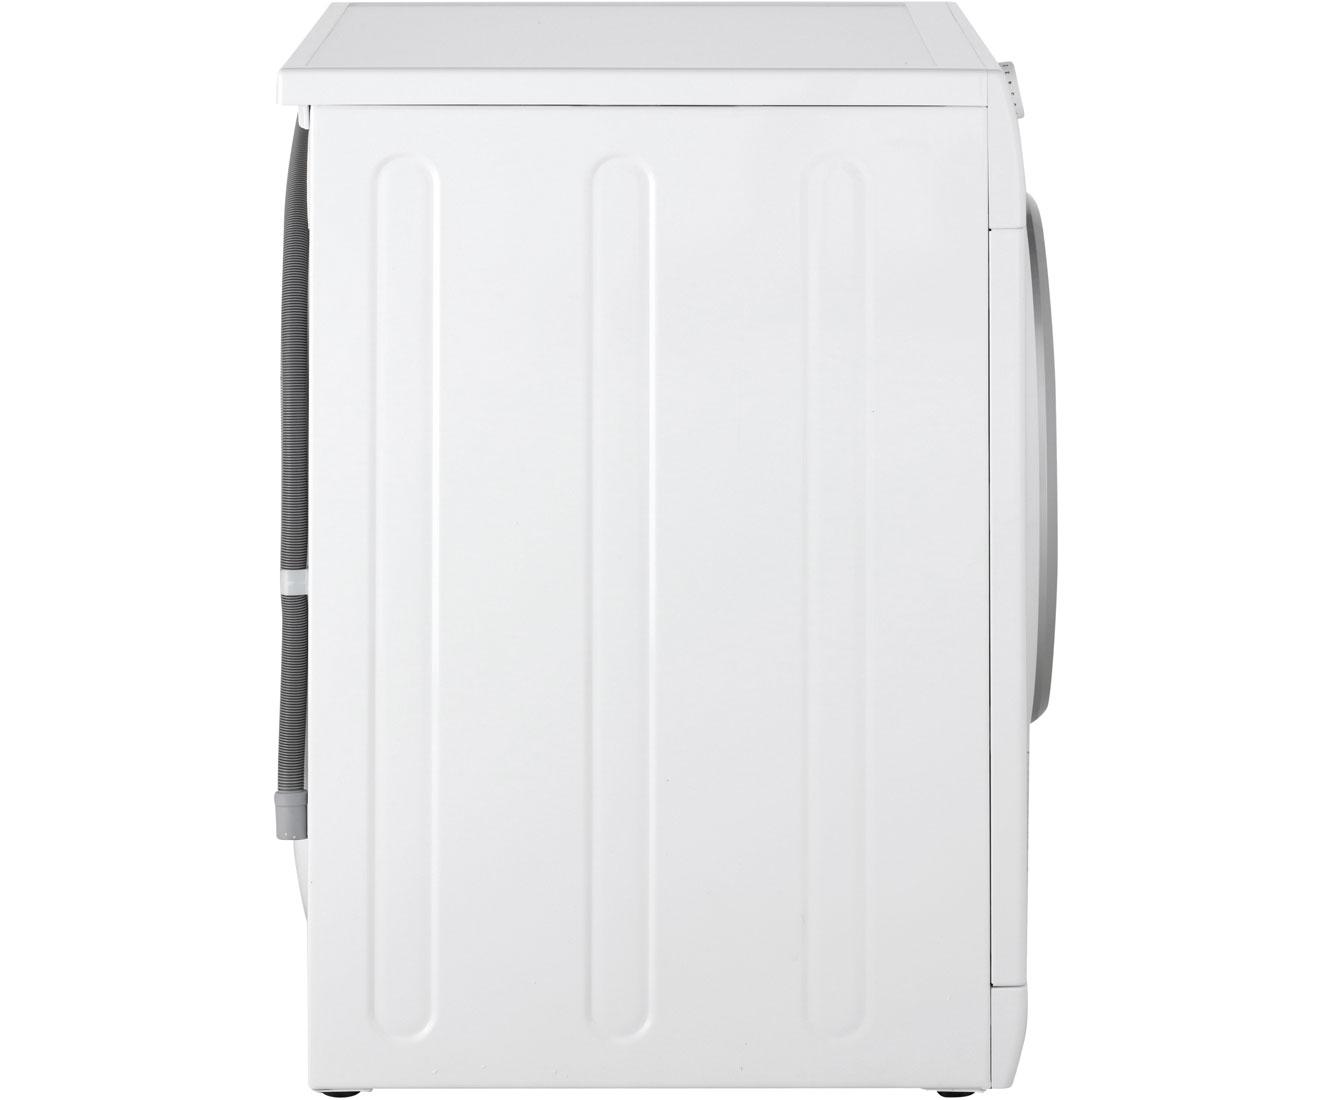 bauknecht wm sense 8g42ps waschmaschine freistehend wei neu ebay. Black Bedroom Furniture Sets. Home Design Ideas